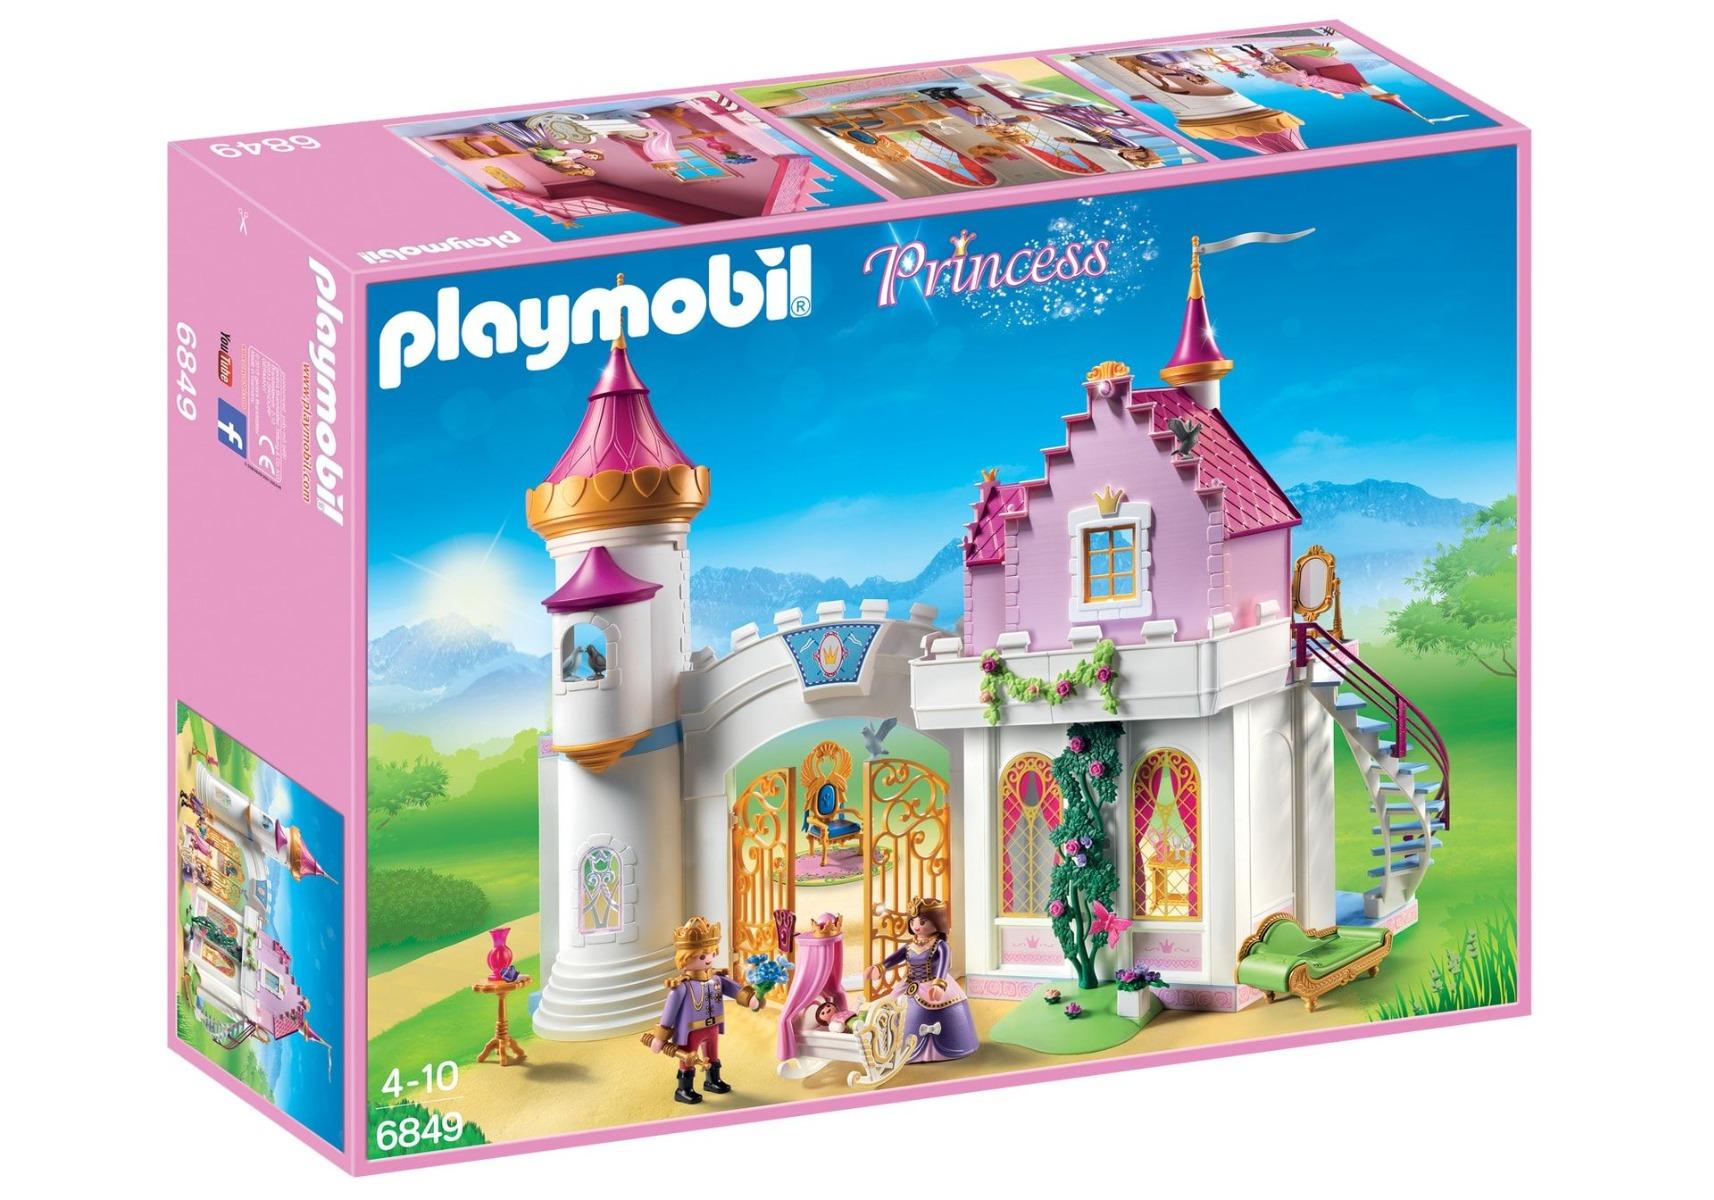 Playmobil PM6849 Casa Regala imagine hippoland.ro